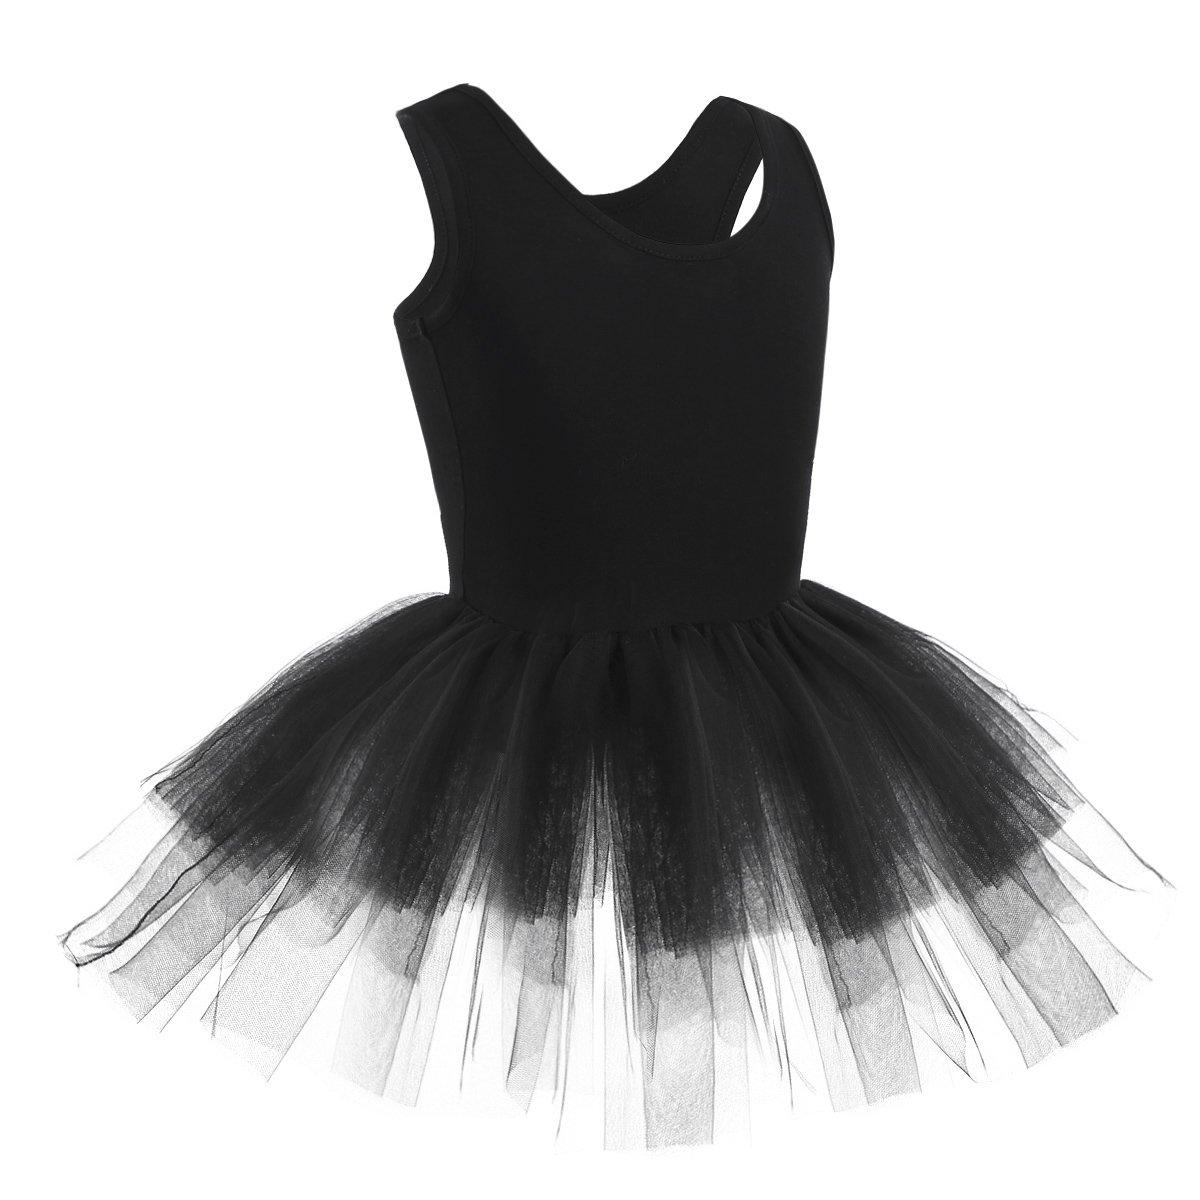 e537be626ed7 CHICTRY Girls  Organic Cotton Tank Tutu Dance Ballet Gymnastics ...